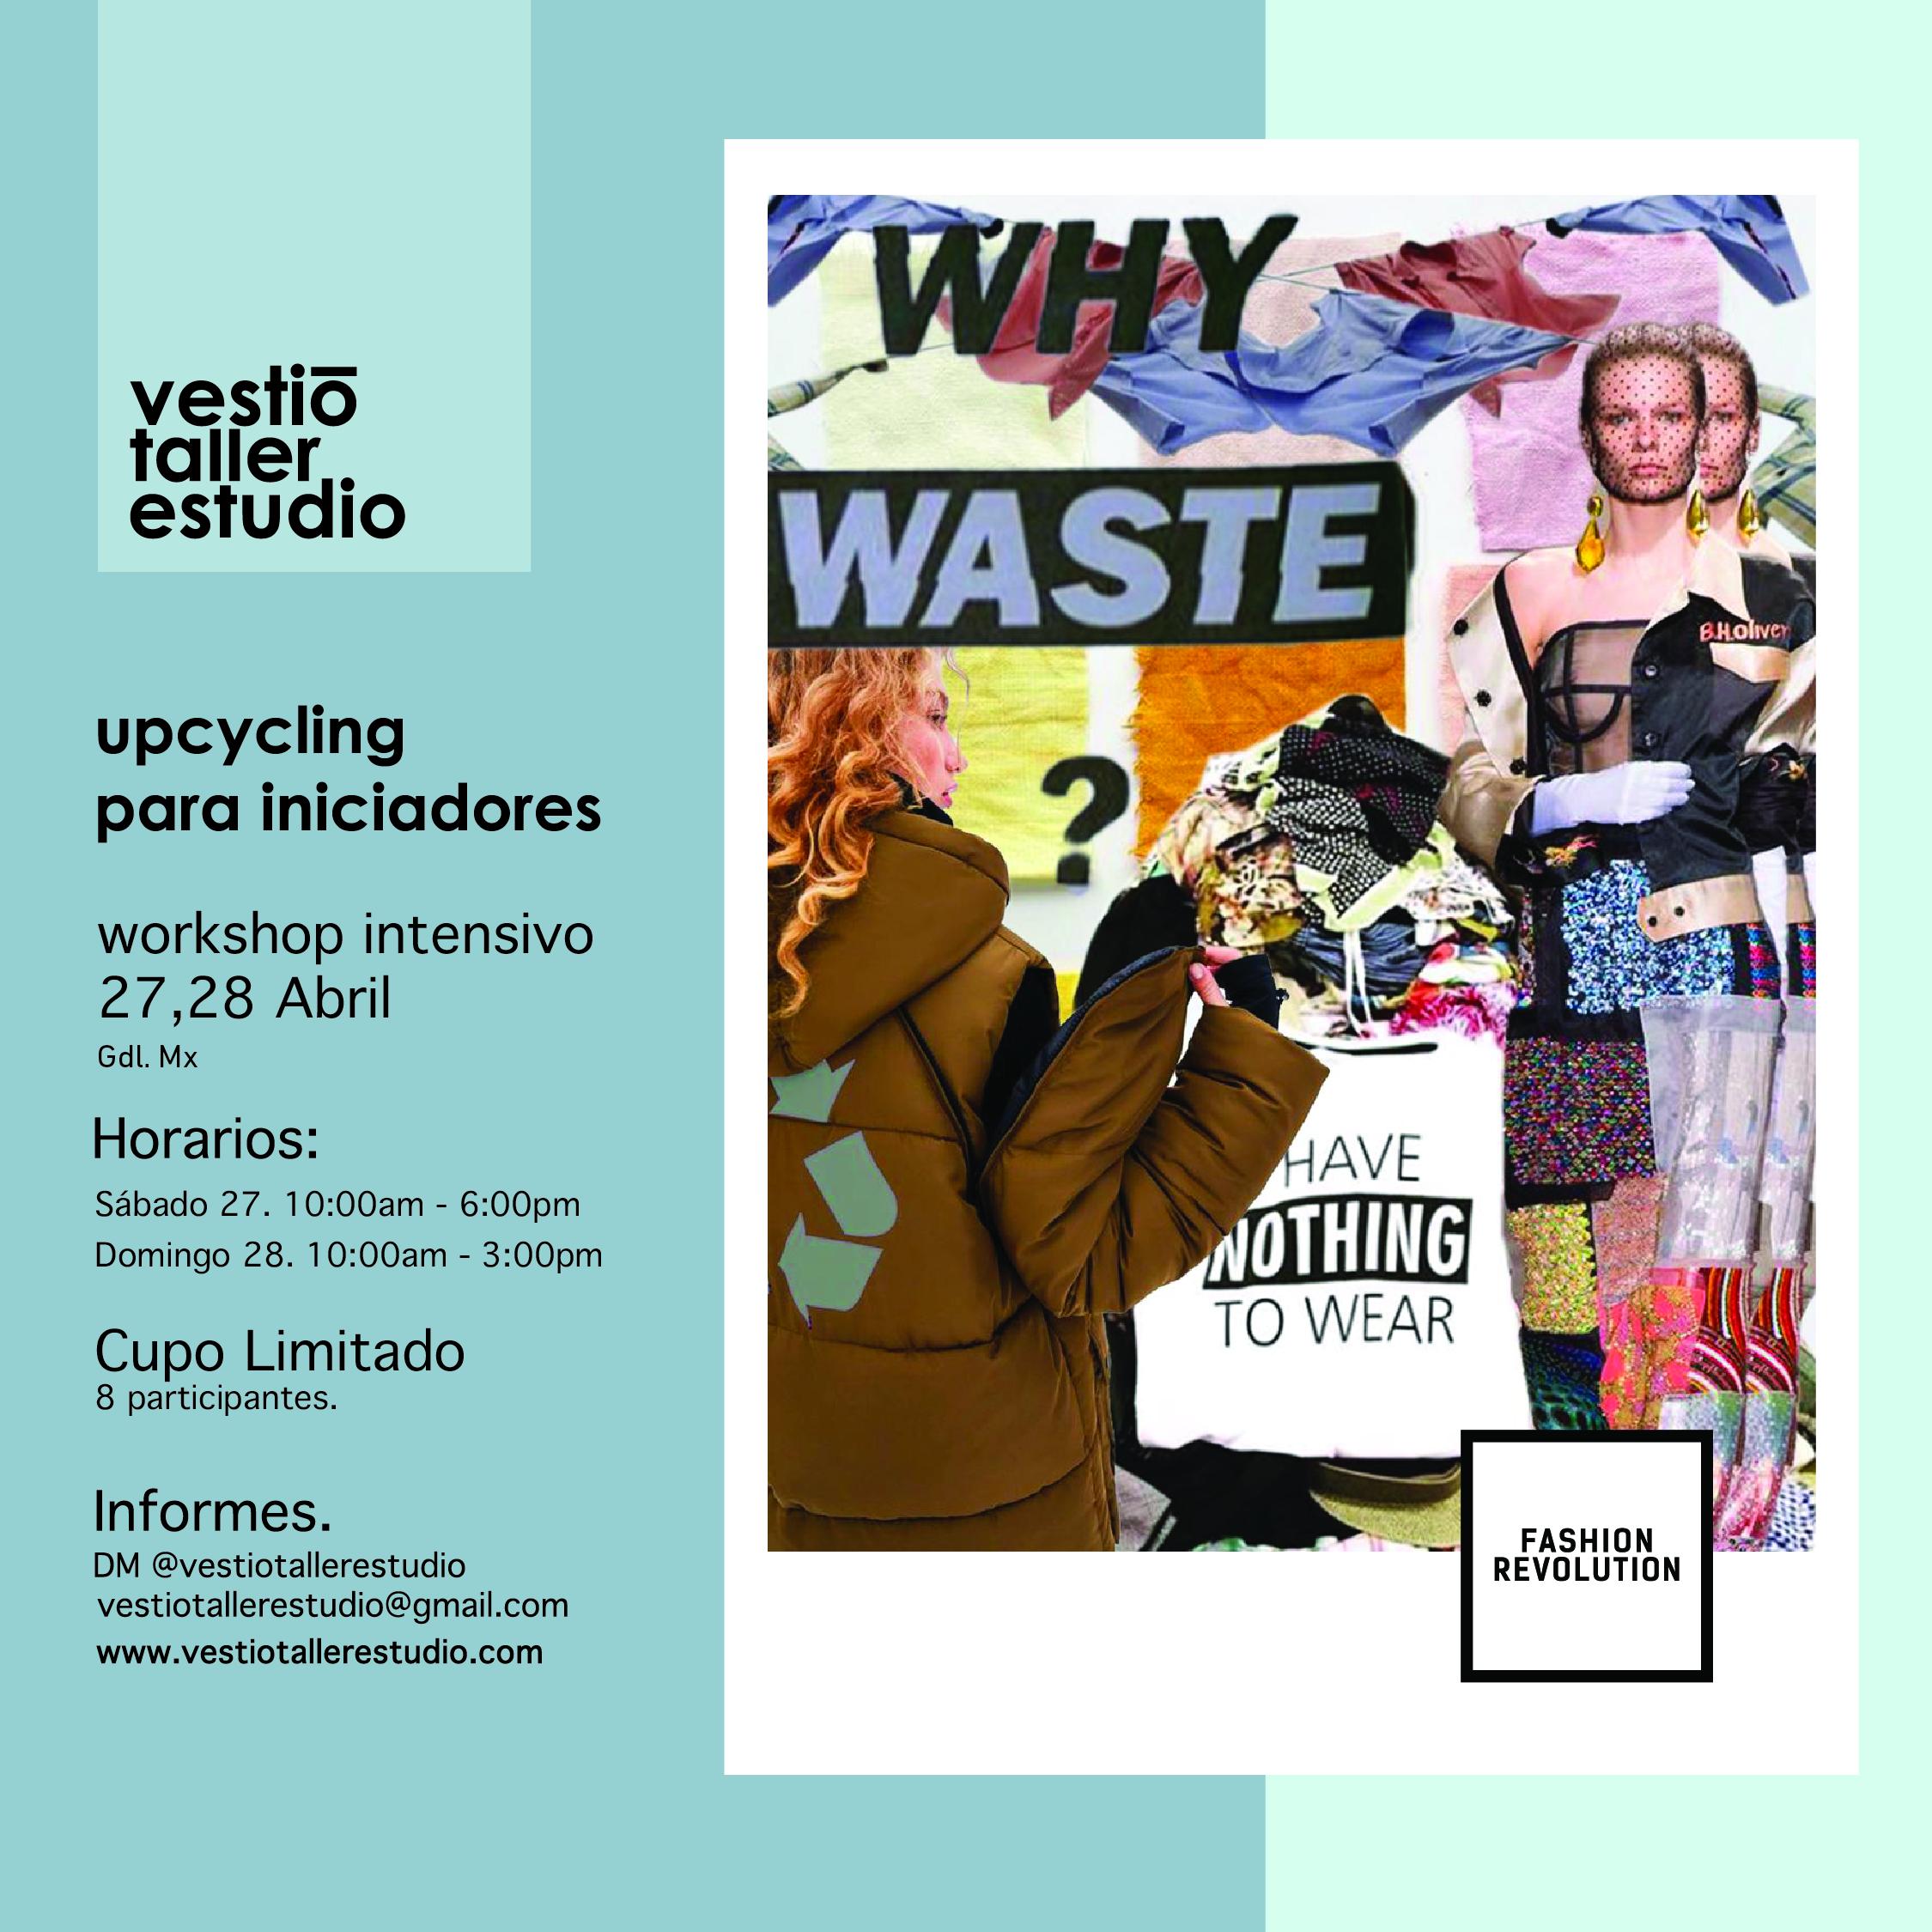 workshop intensivo upcycling para iniciadores